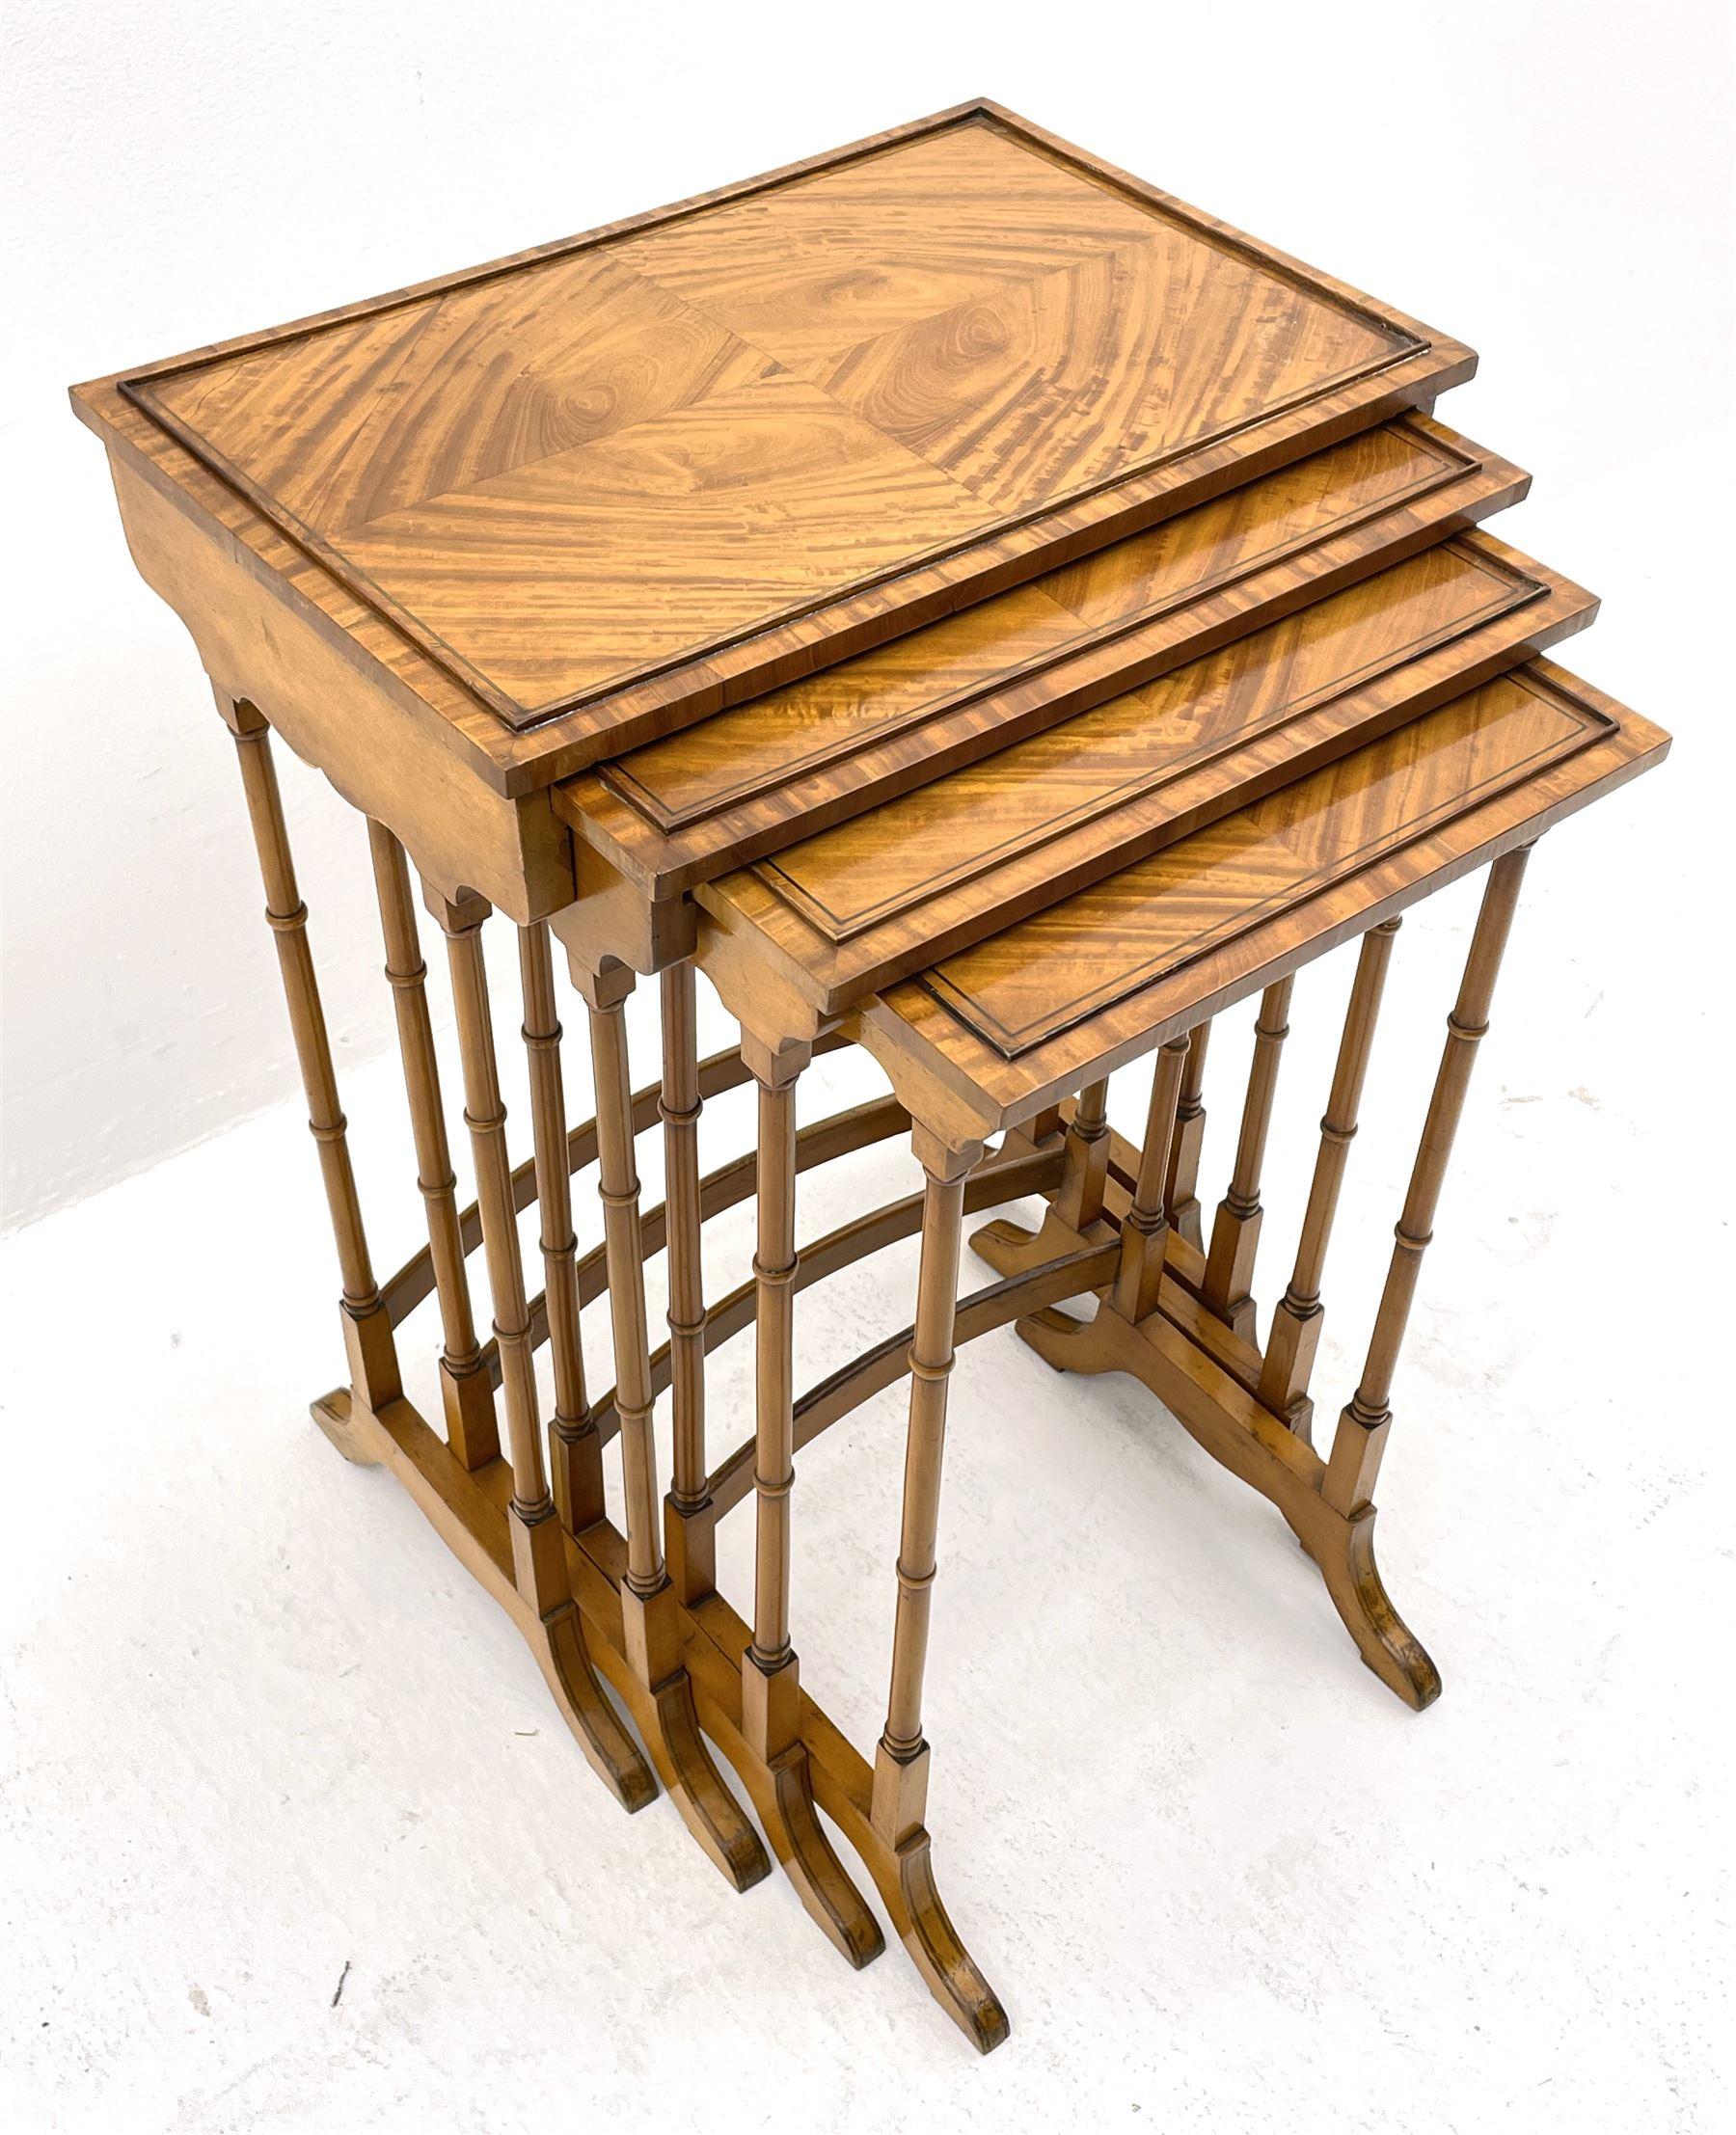 Edwardian satinwood quartetto nest of occasional tables - Image 3 of 6